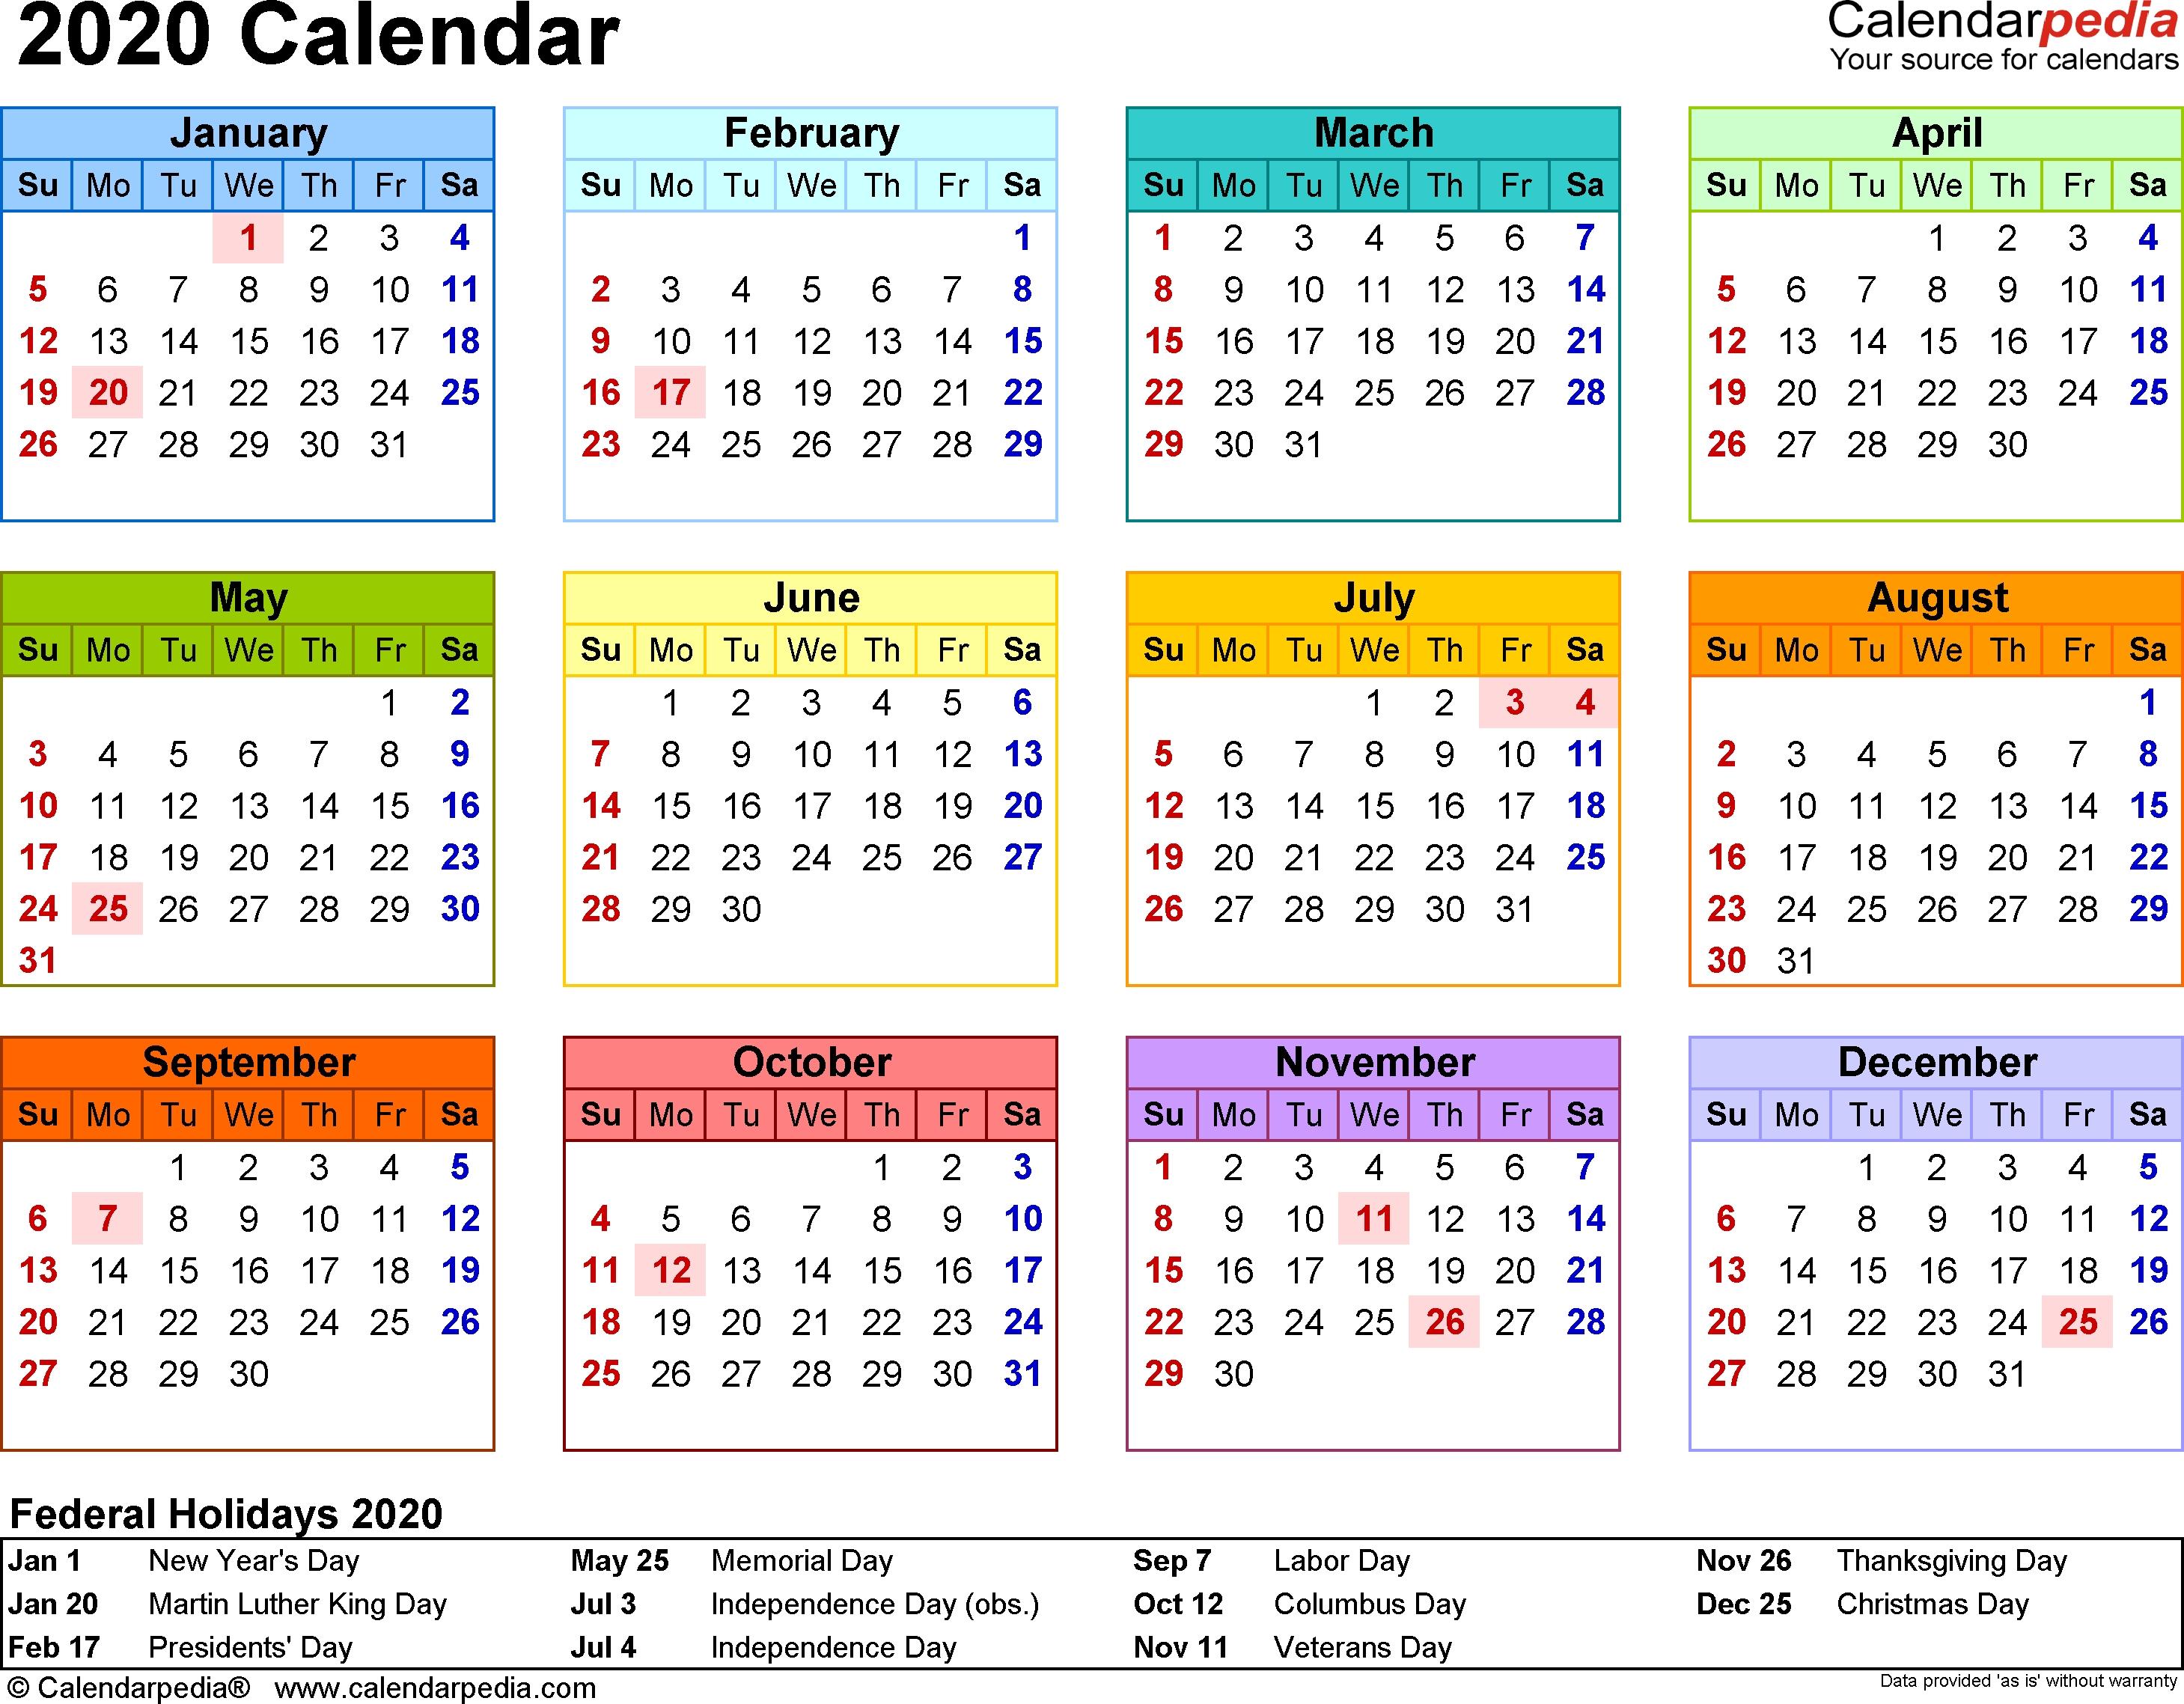 2020 Calendar - 18 Free Printable Word Calendar Templates-Downloadable 2020 Calendar Template Word